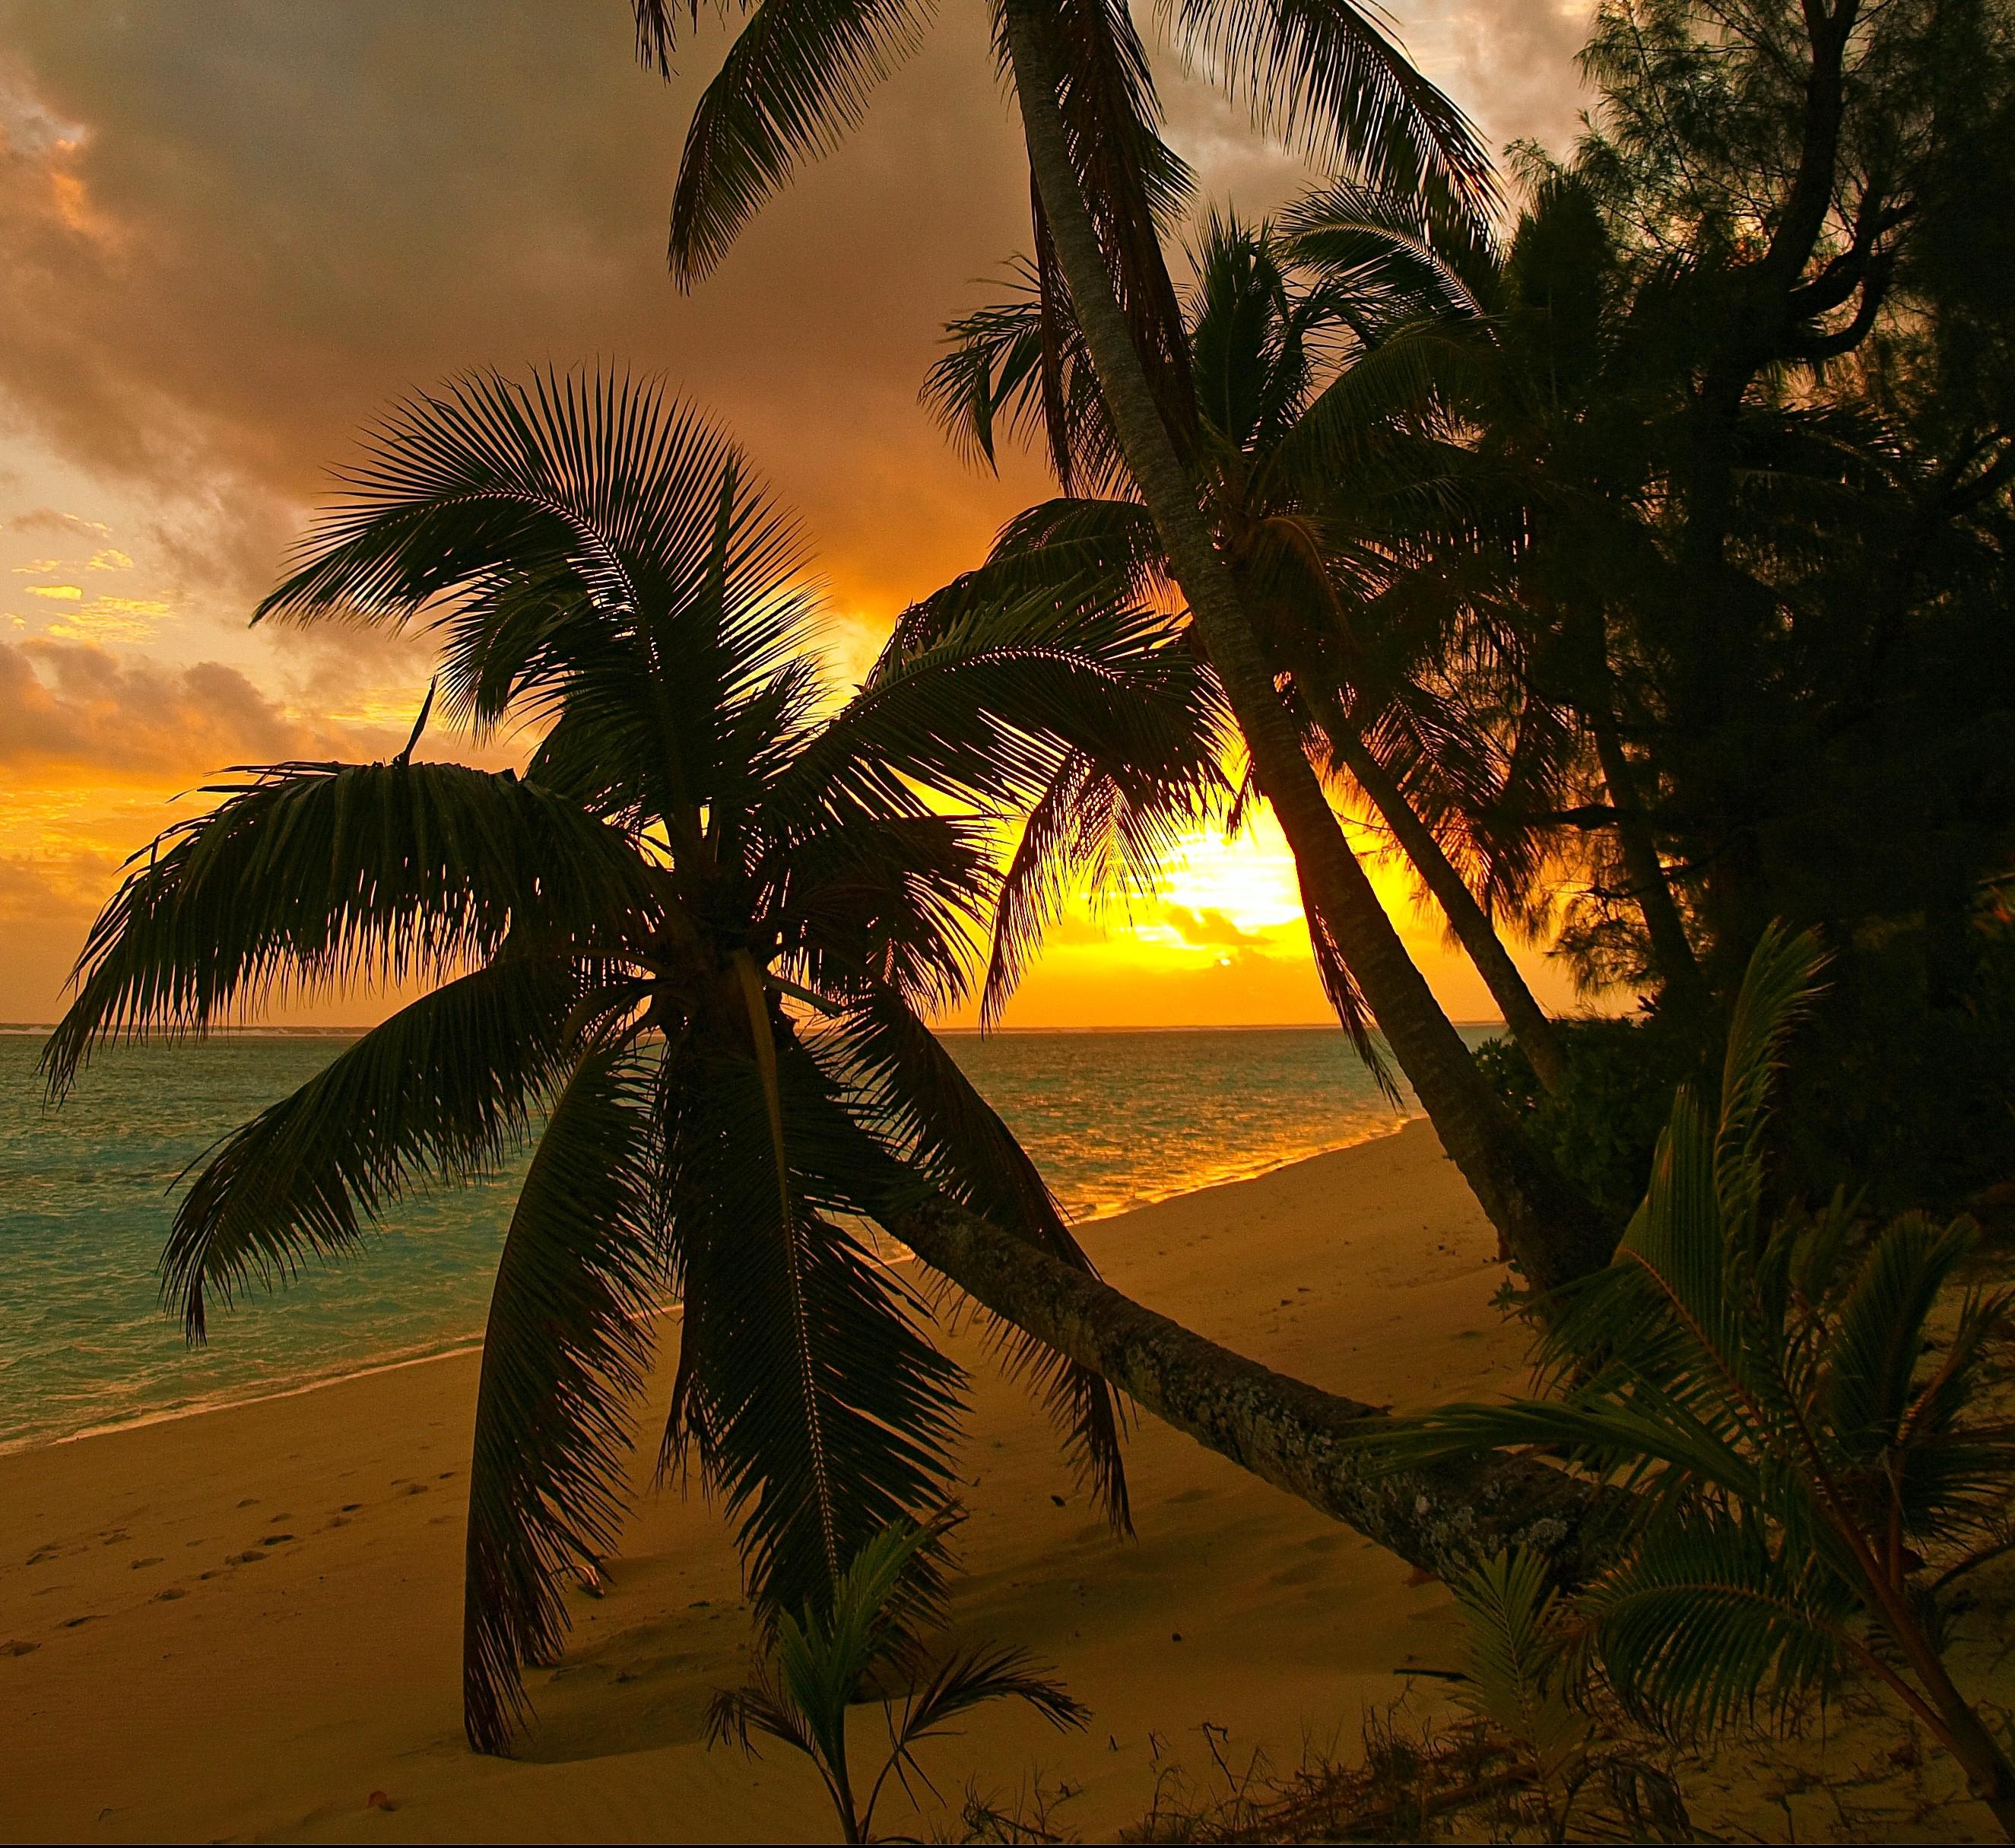 Beaches: Ocean Clouds Sunset Idyllic Pacific Beach Trees Hour ...